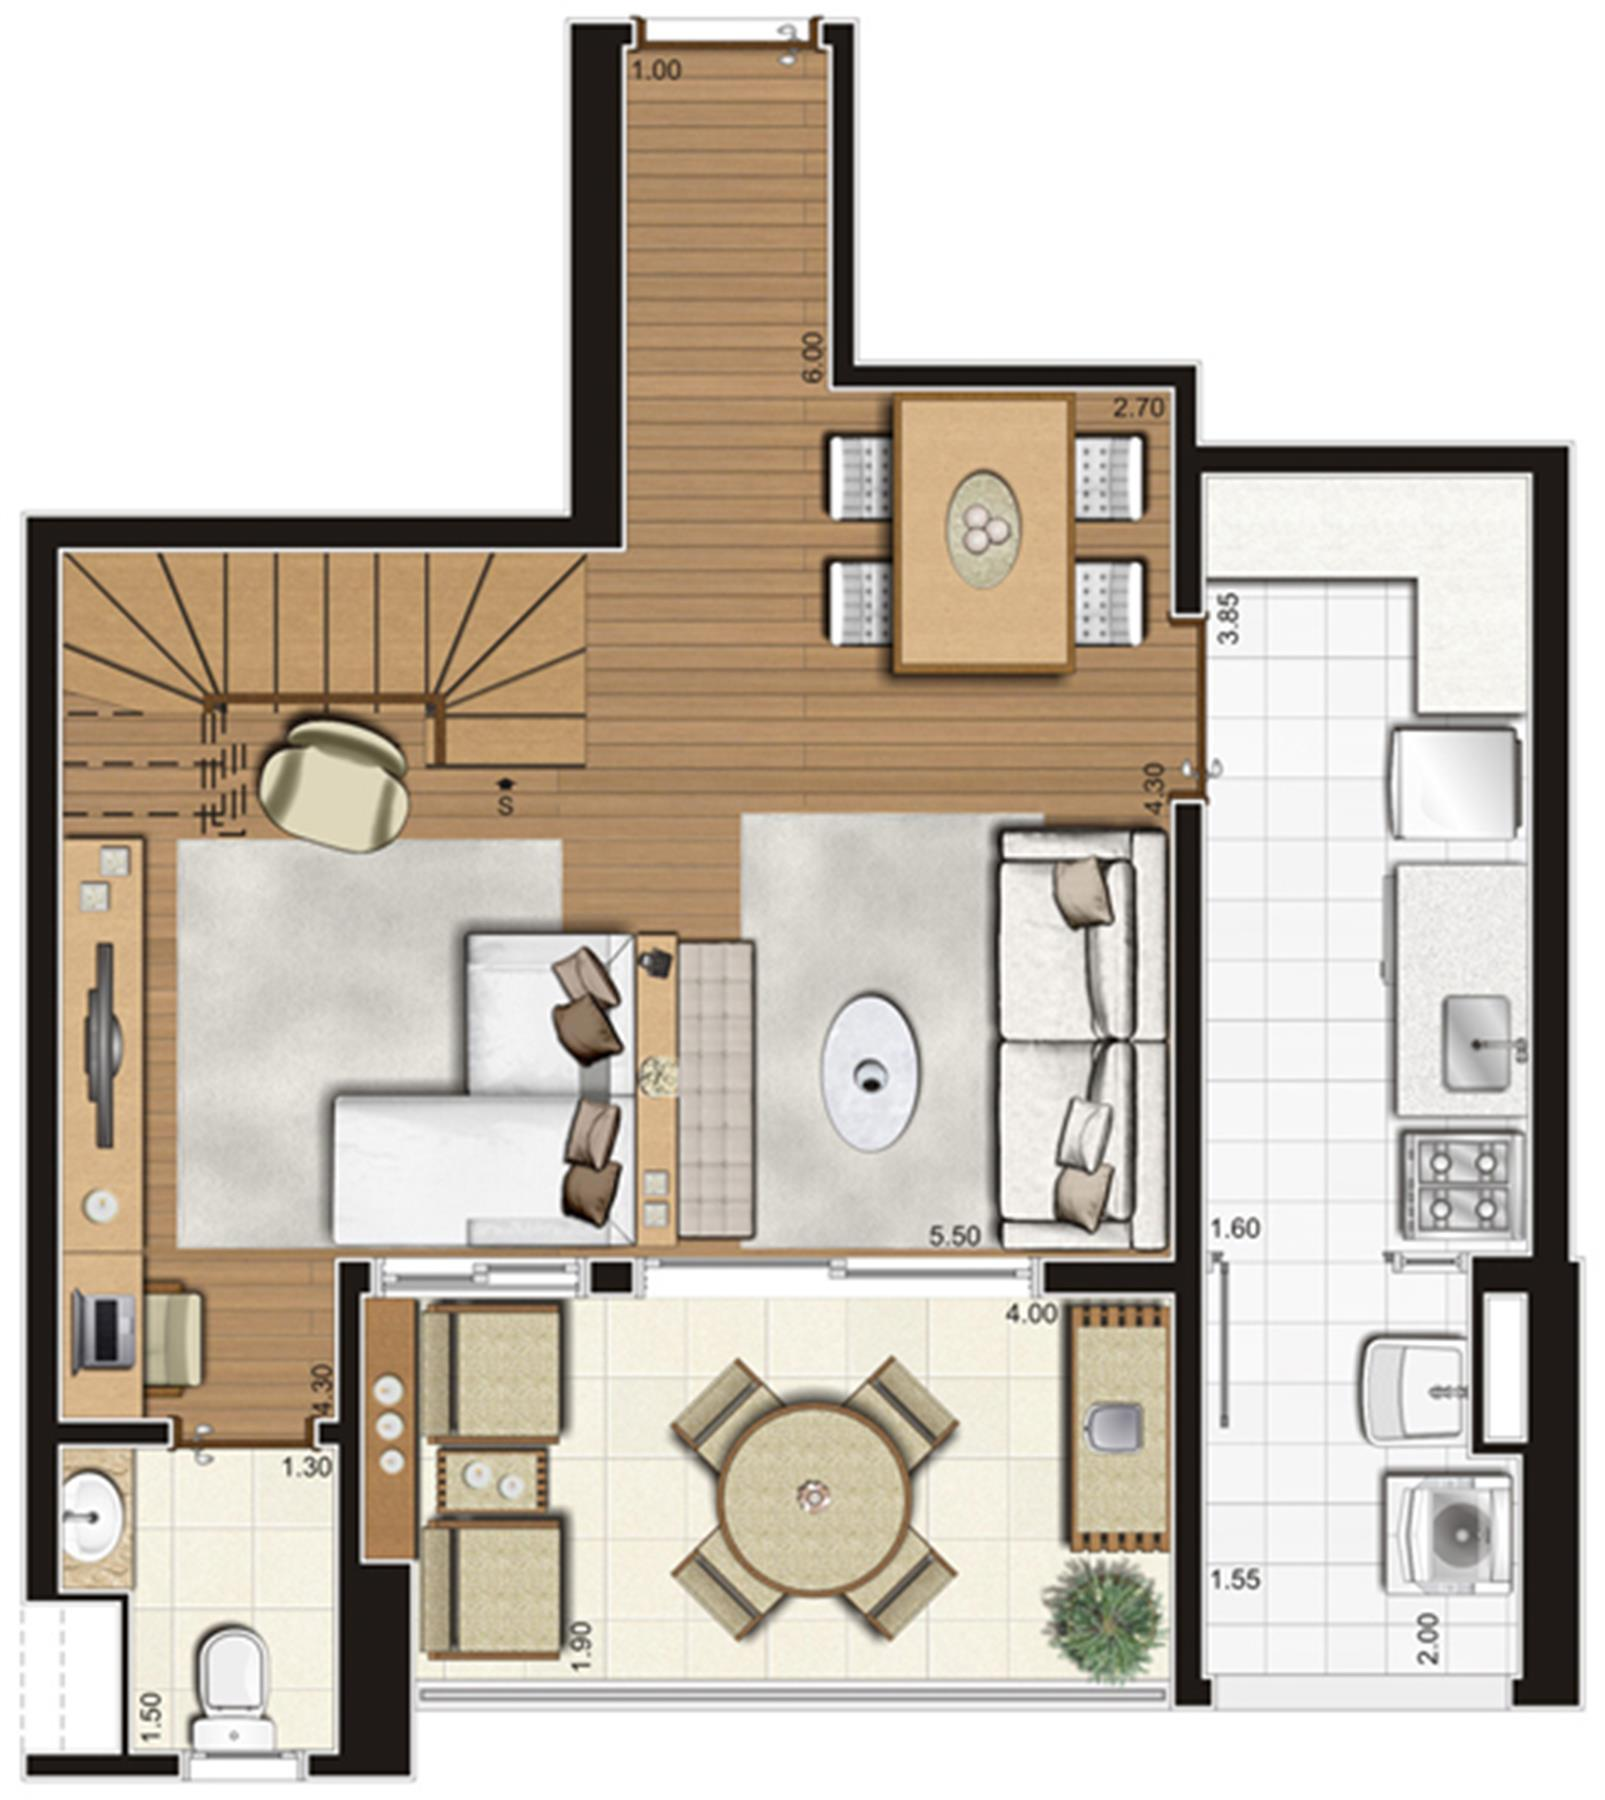 Planta-tipo do pavimento inferior do apartamento duplex de 95 m² privativos, finais 5 e 10 | Tempo Bello – Apartamentono  Campo Belo - São Paulo - São Paulo